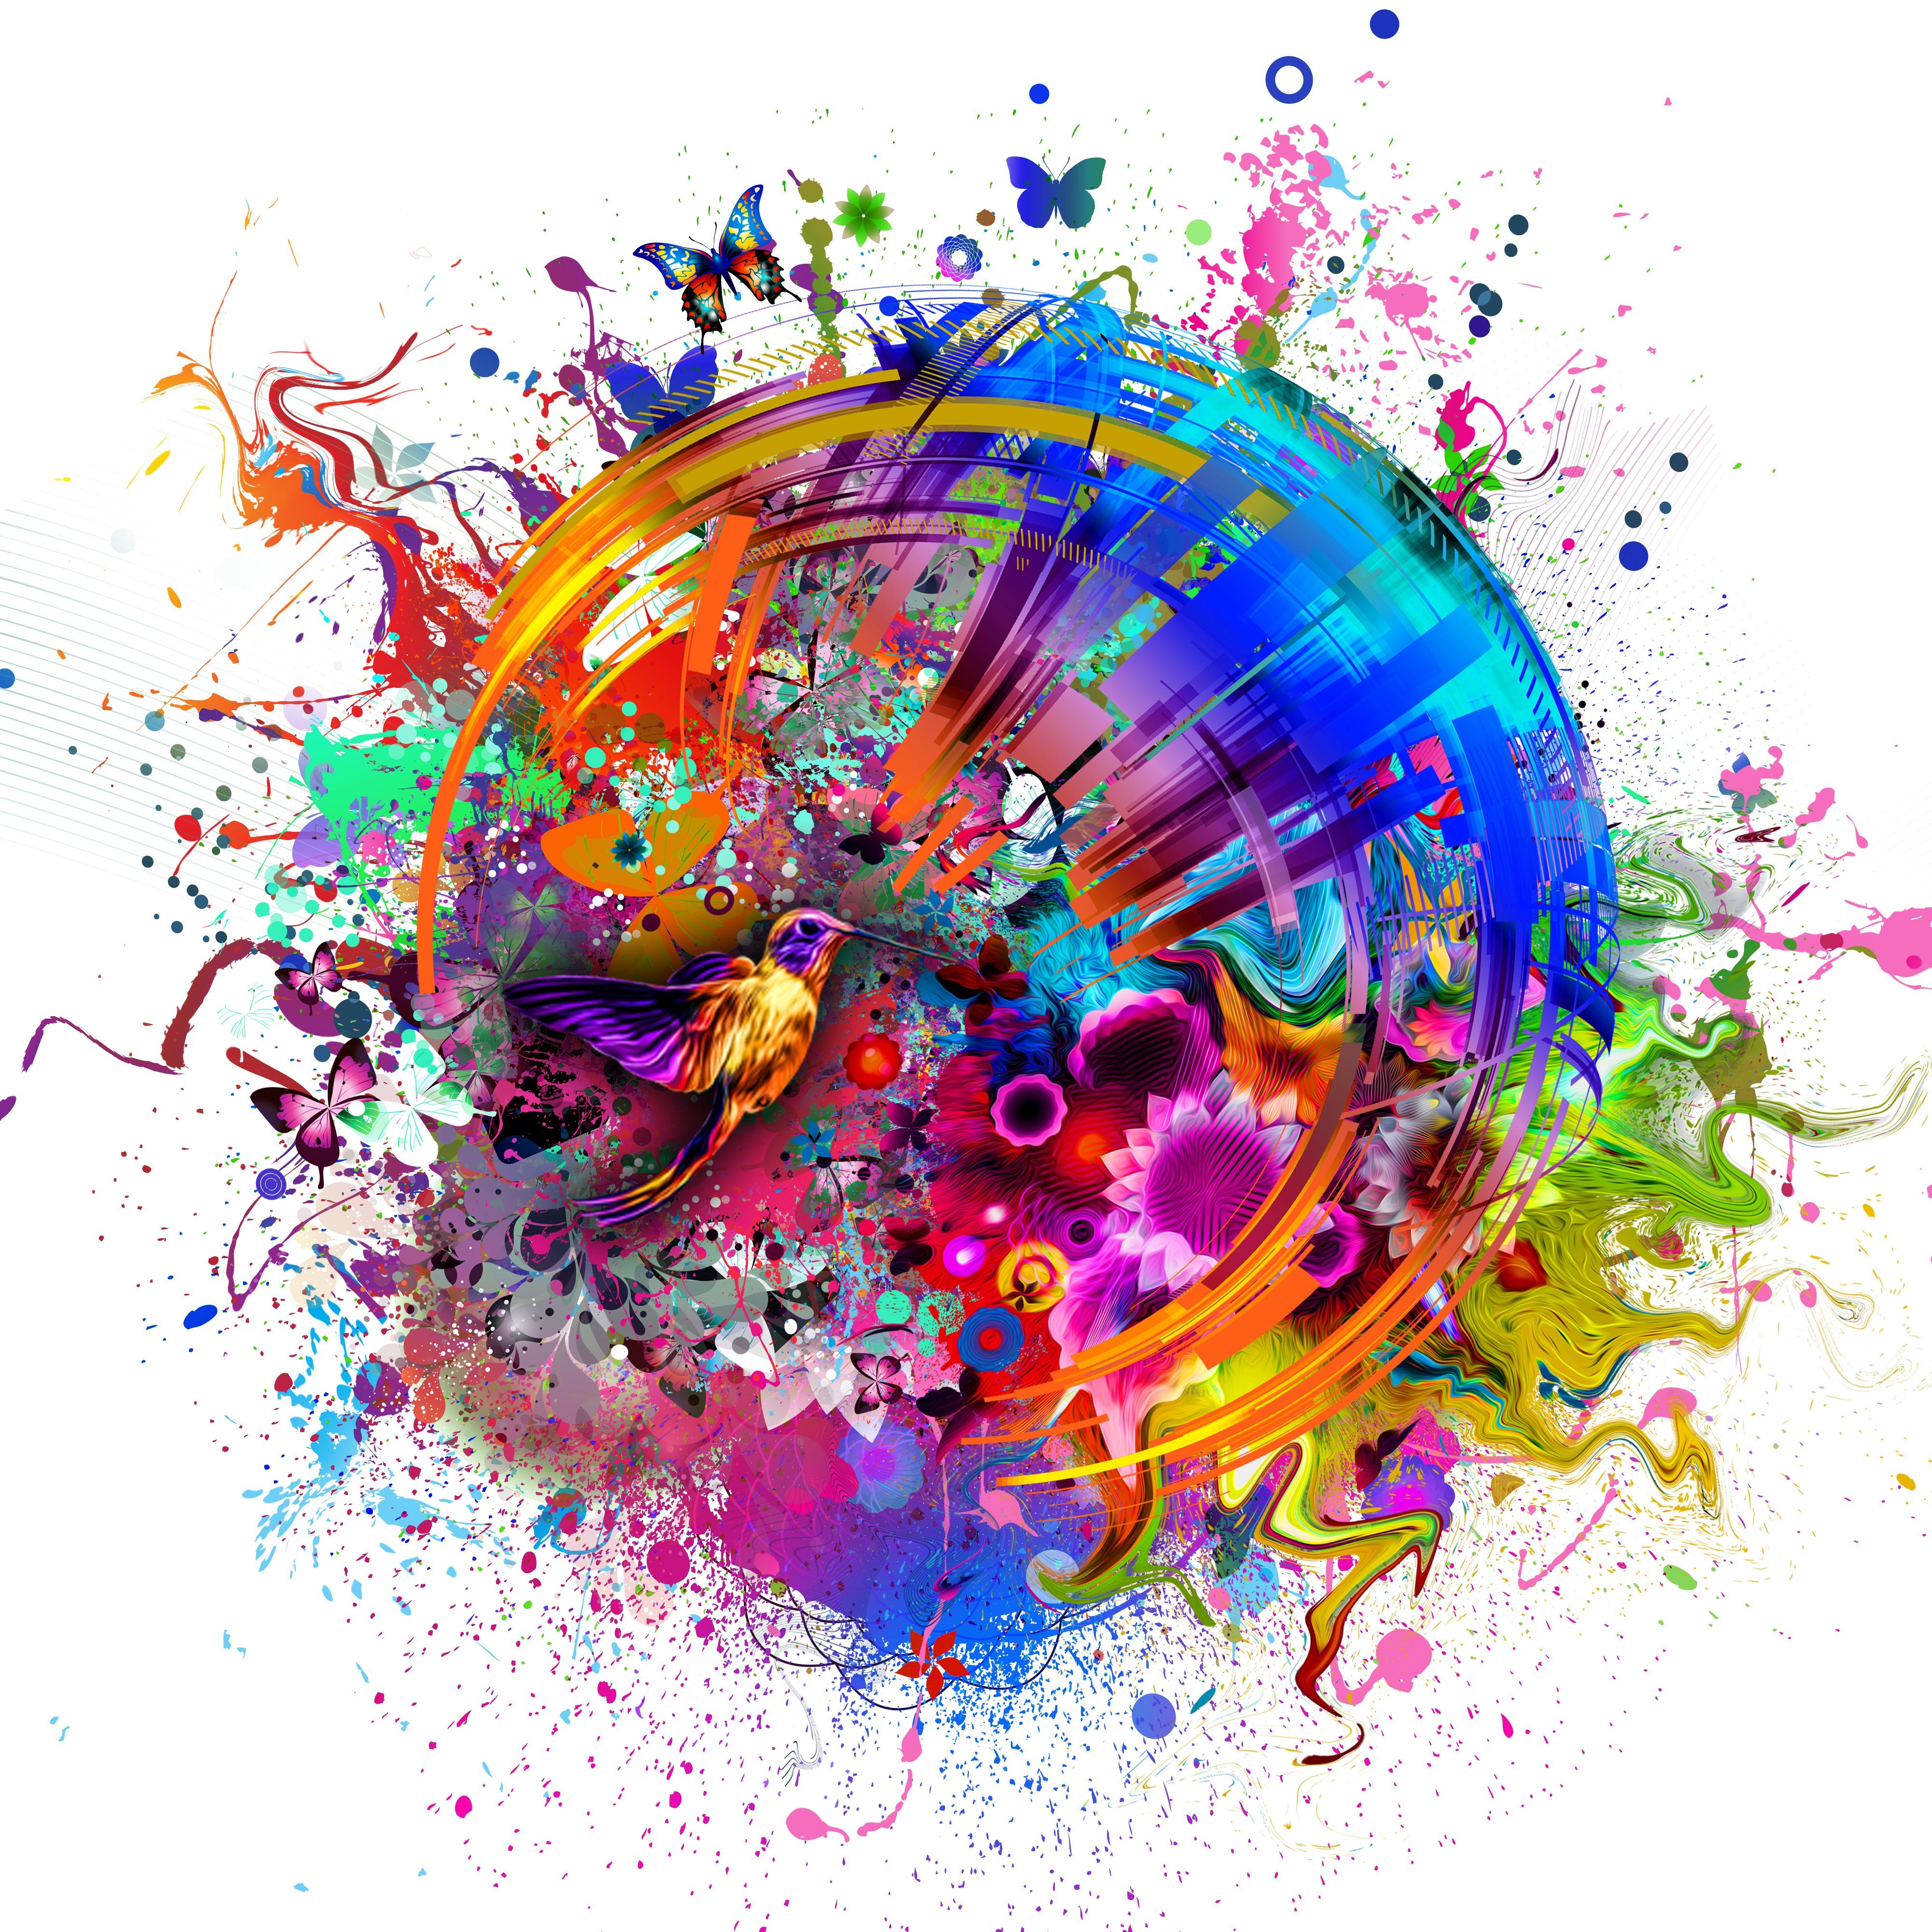 4k Resolution Wallpaper: 2560x1440 Abstract Colors Flashy Bird 4k 1440P Resolution